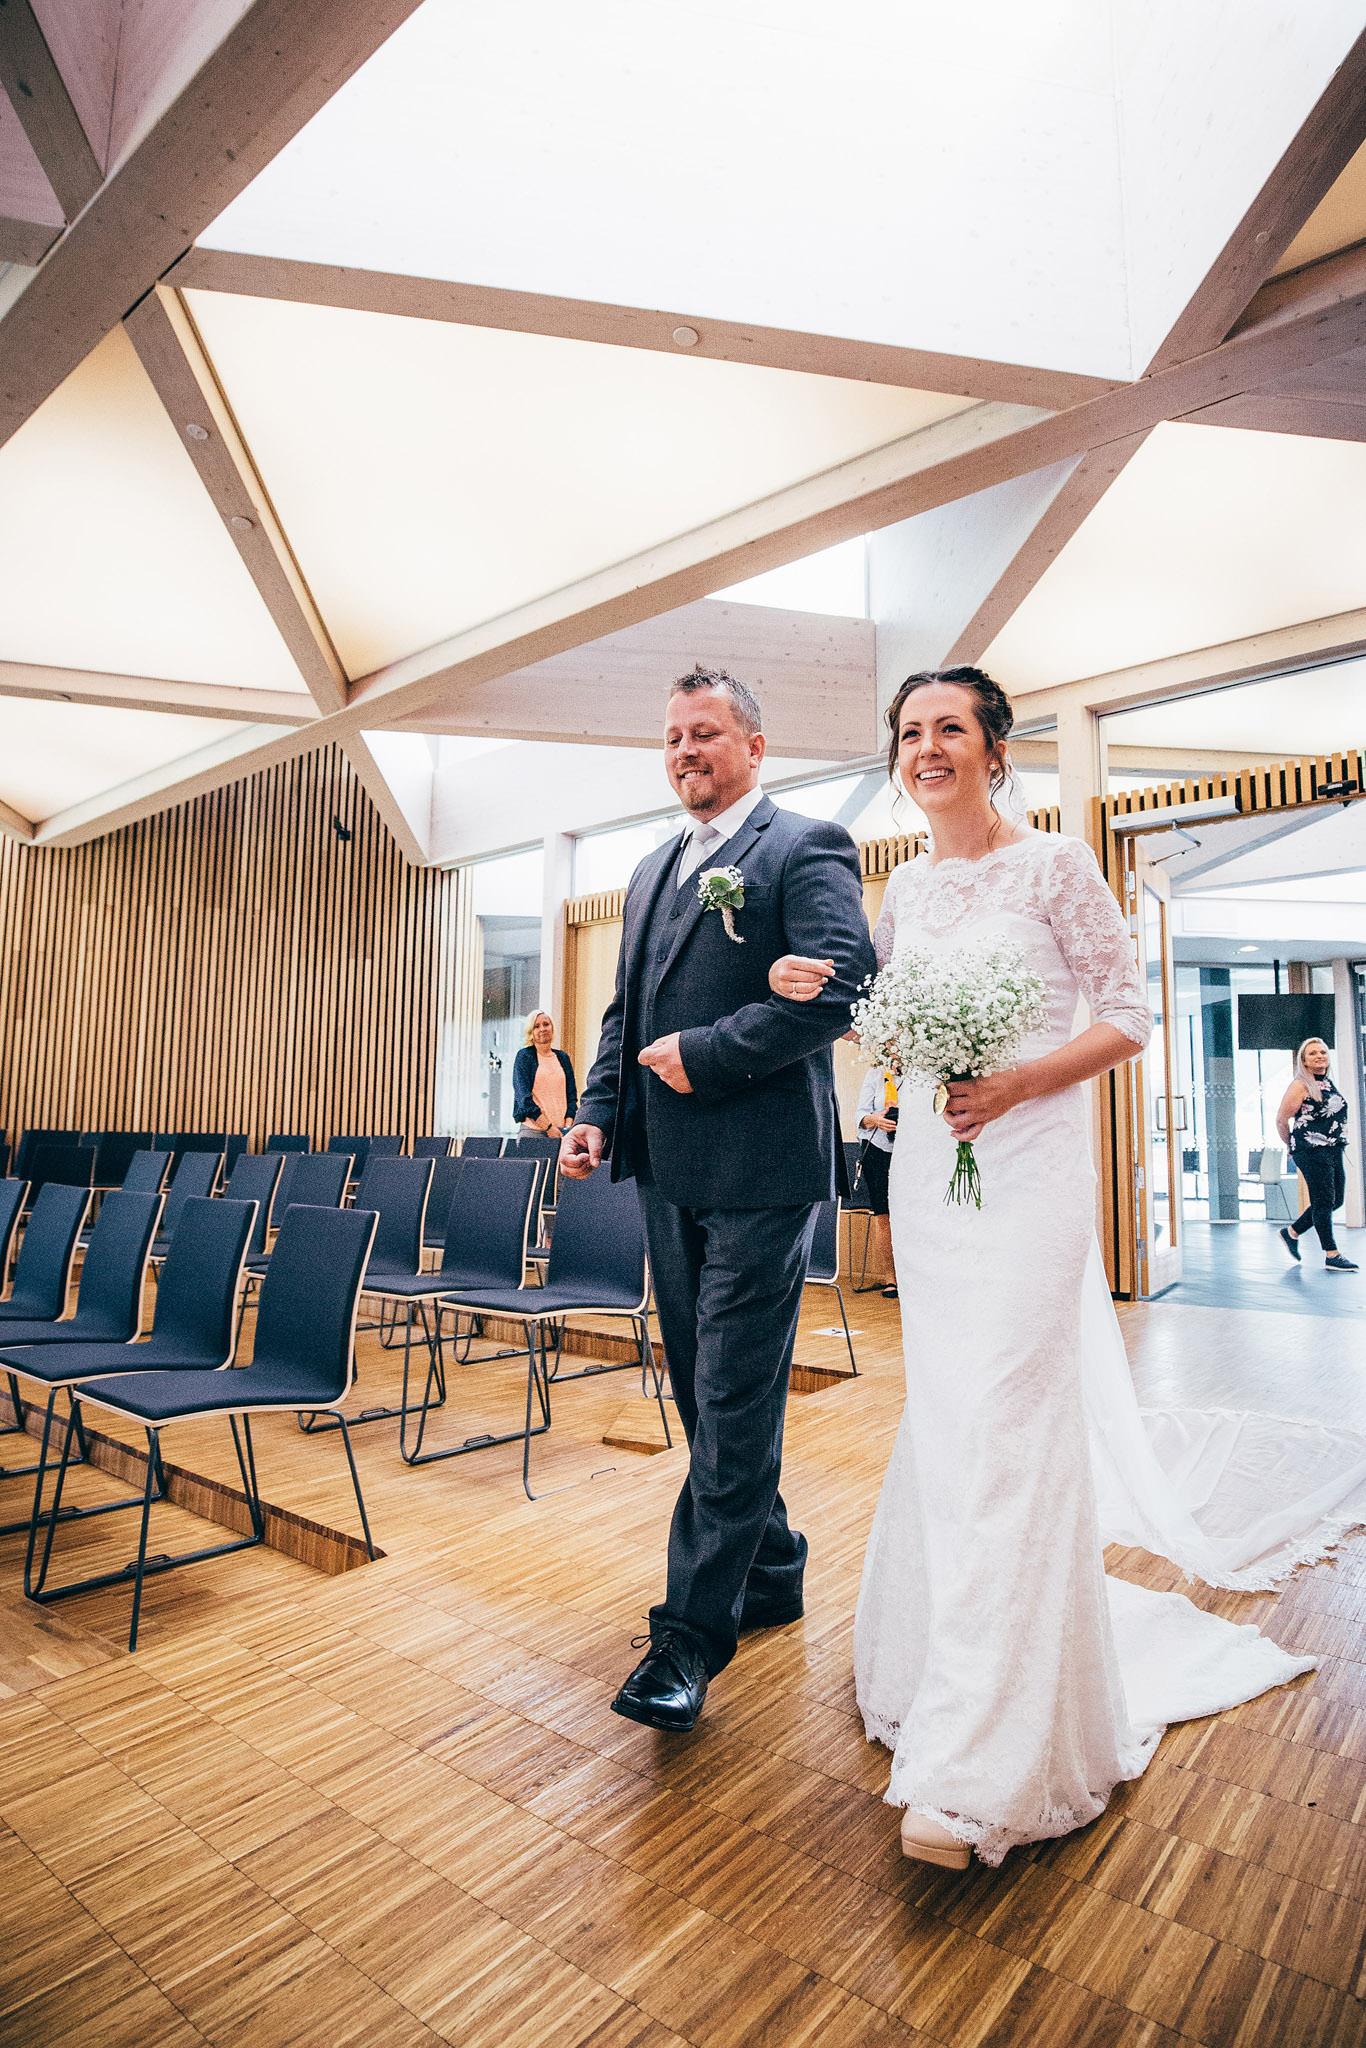 Norway+wedding+photographer+elopement+pre+wedding+Casey+Arneson-32.jpg